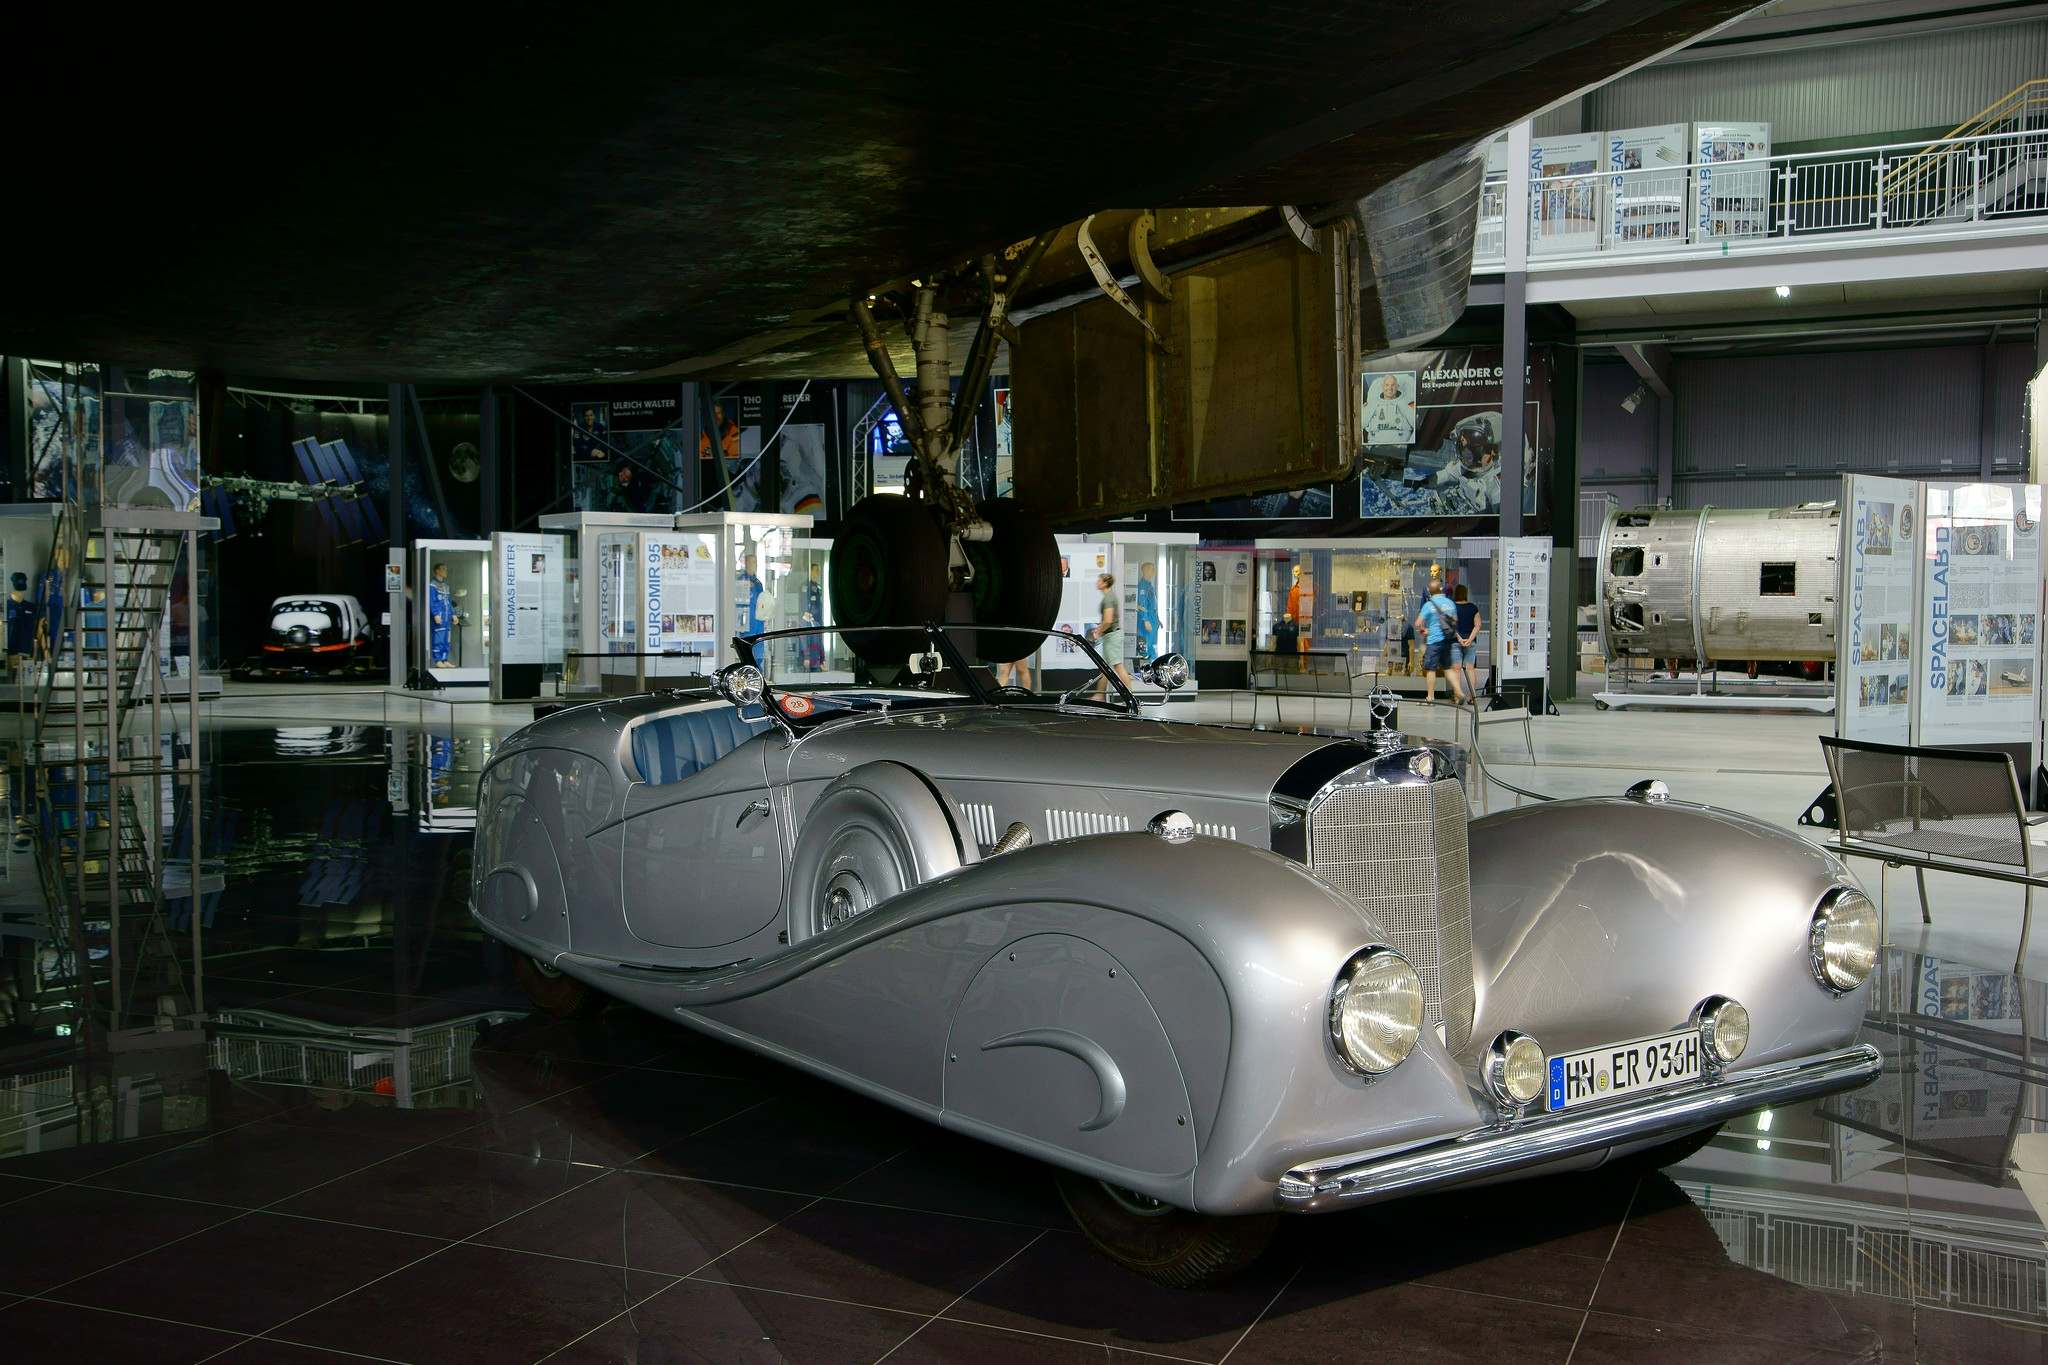 technik museum speyer9 Technical Museum of Speyer, Germany